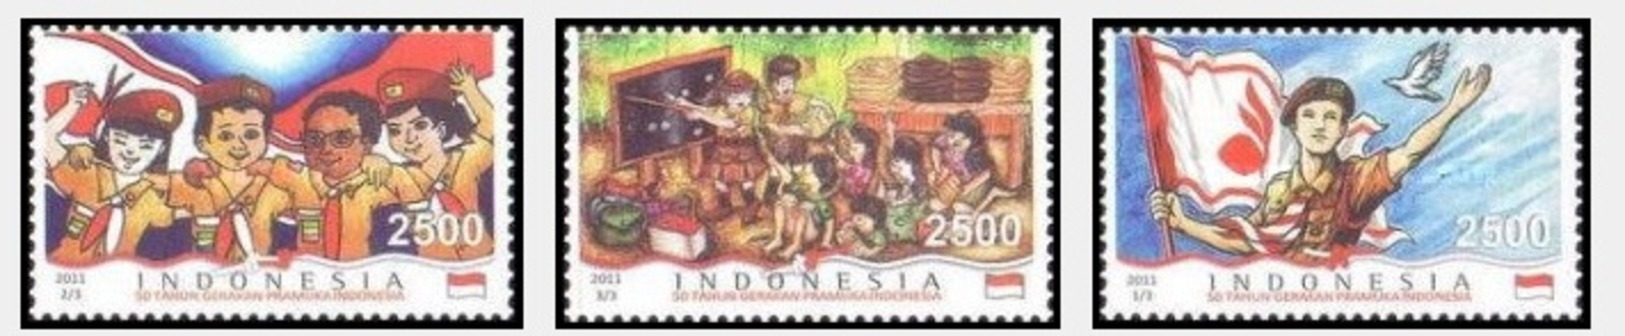 386Indonesia 2011 Scout - Indonesia